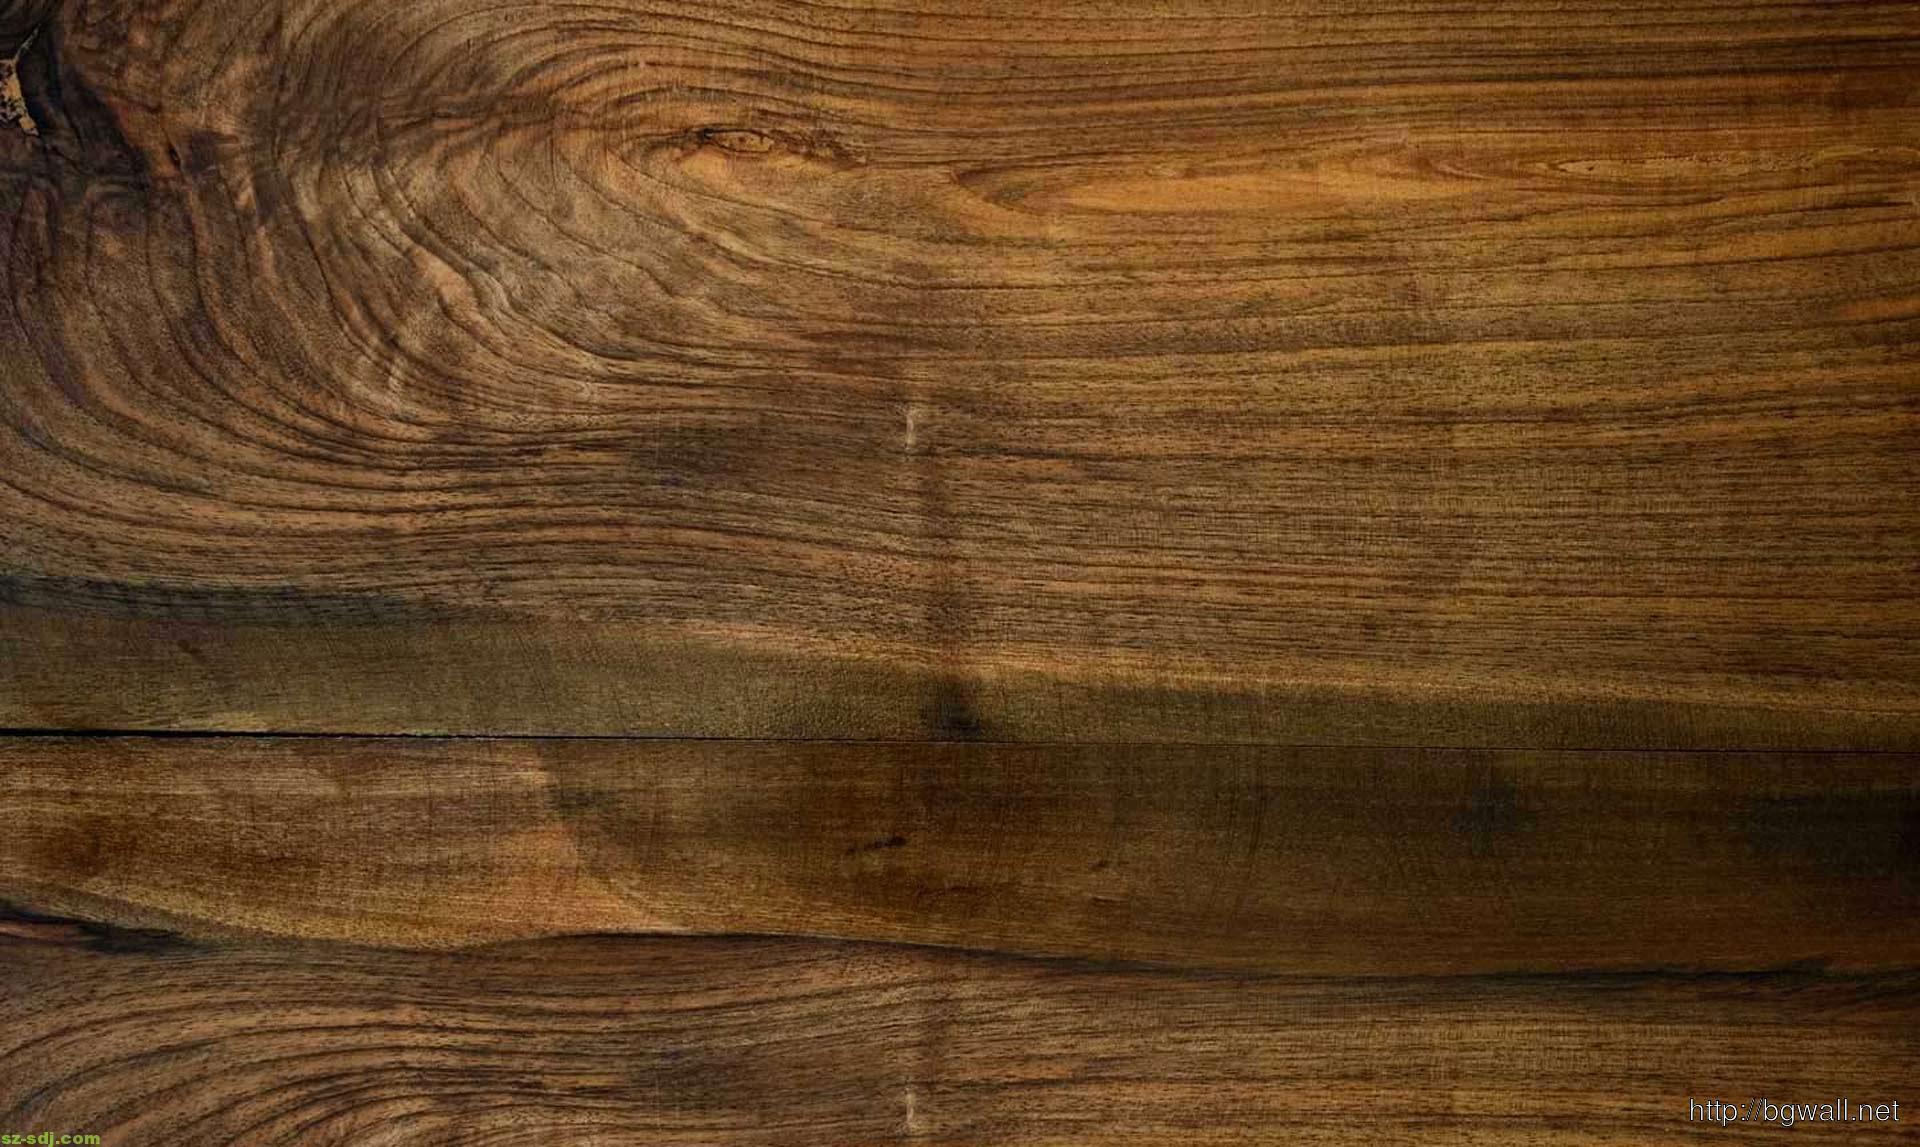 Wallpapers Hd Joker Brown Wood Texture Wallpaper Background Background